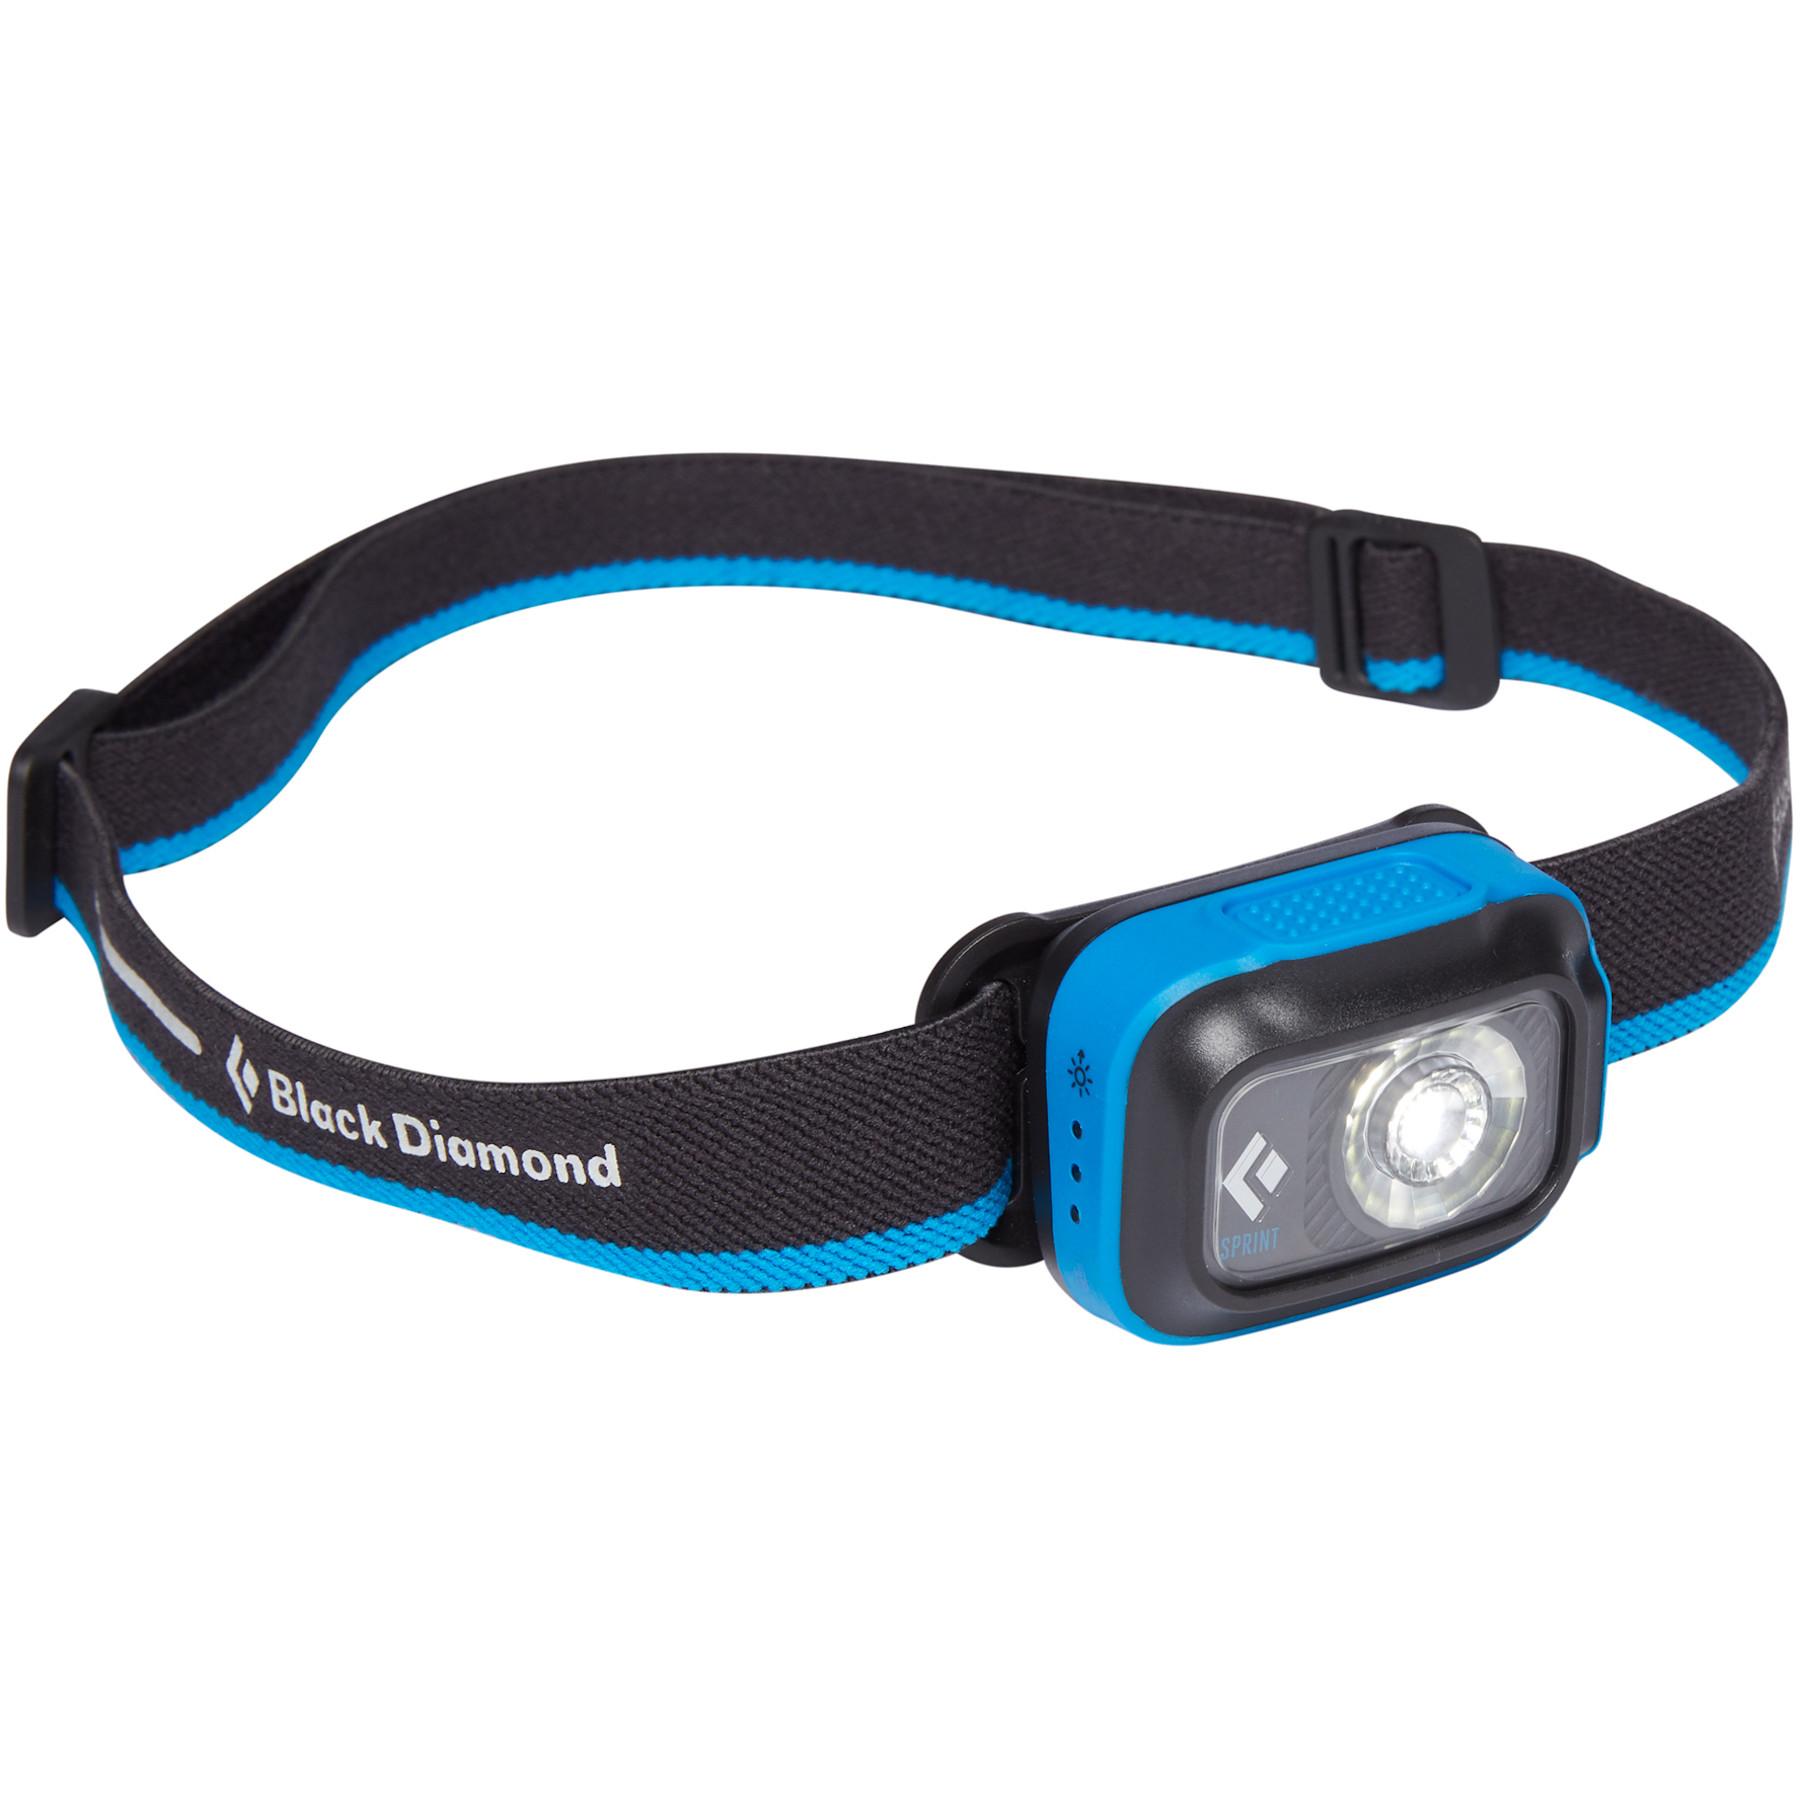 Black Diamond Sprint 225 Headlamp - Ultra Blue